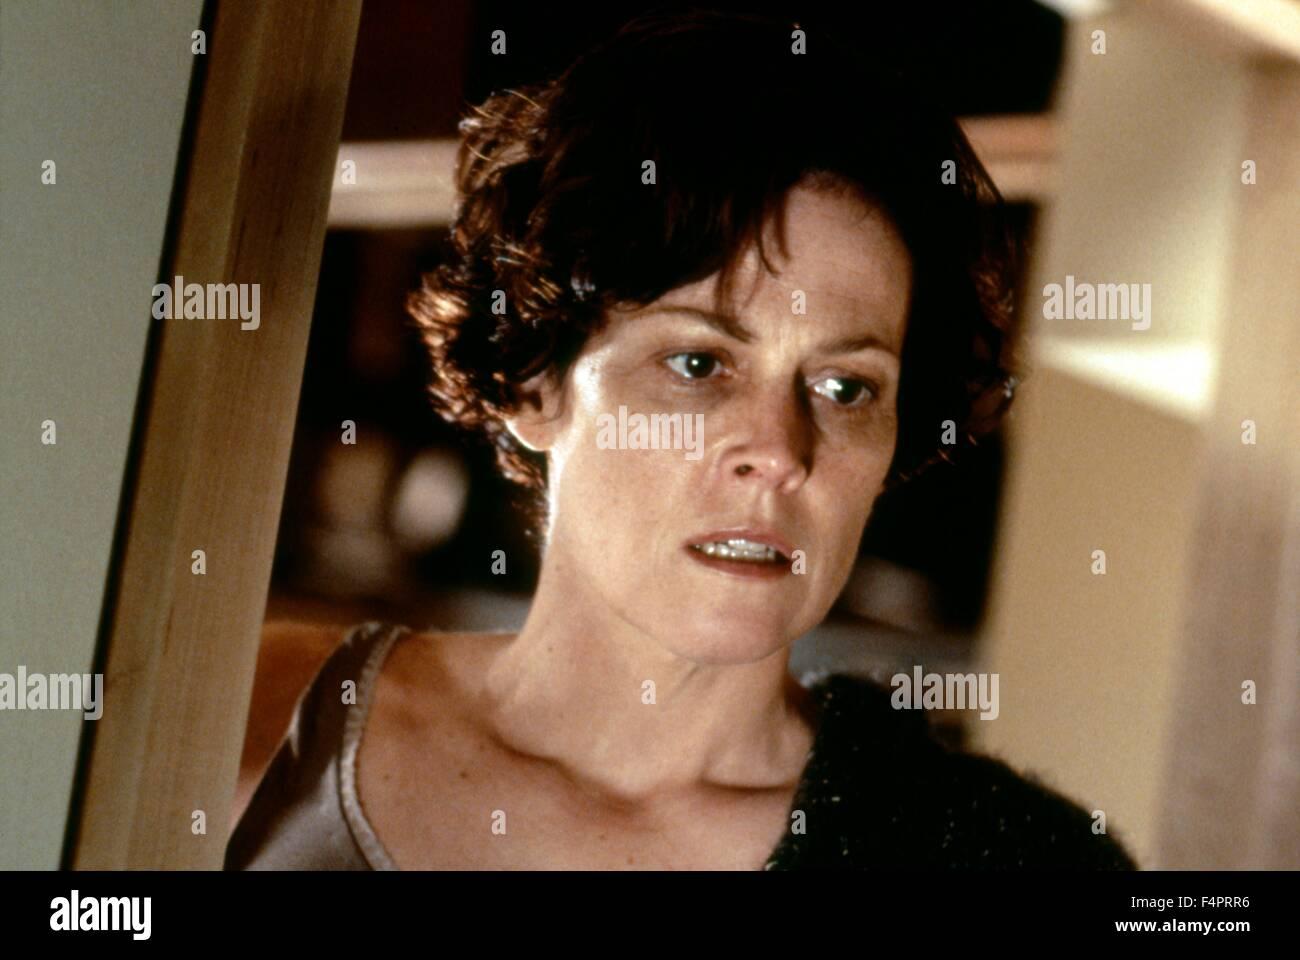 Sigourney Weaver / Copycat / 1995 directed by Jon Amiel [Warner Bros. Pictures] - Stock Image